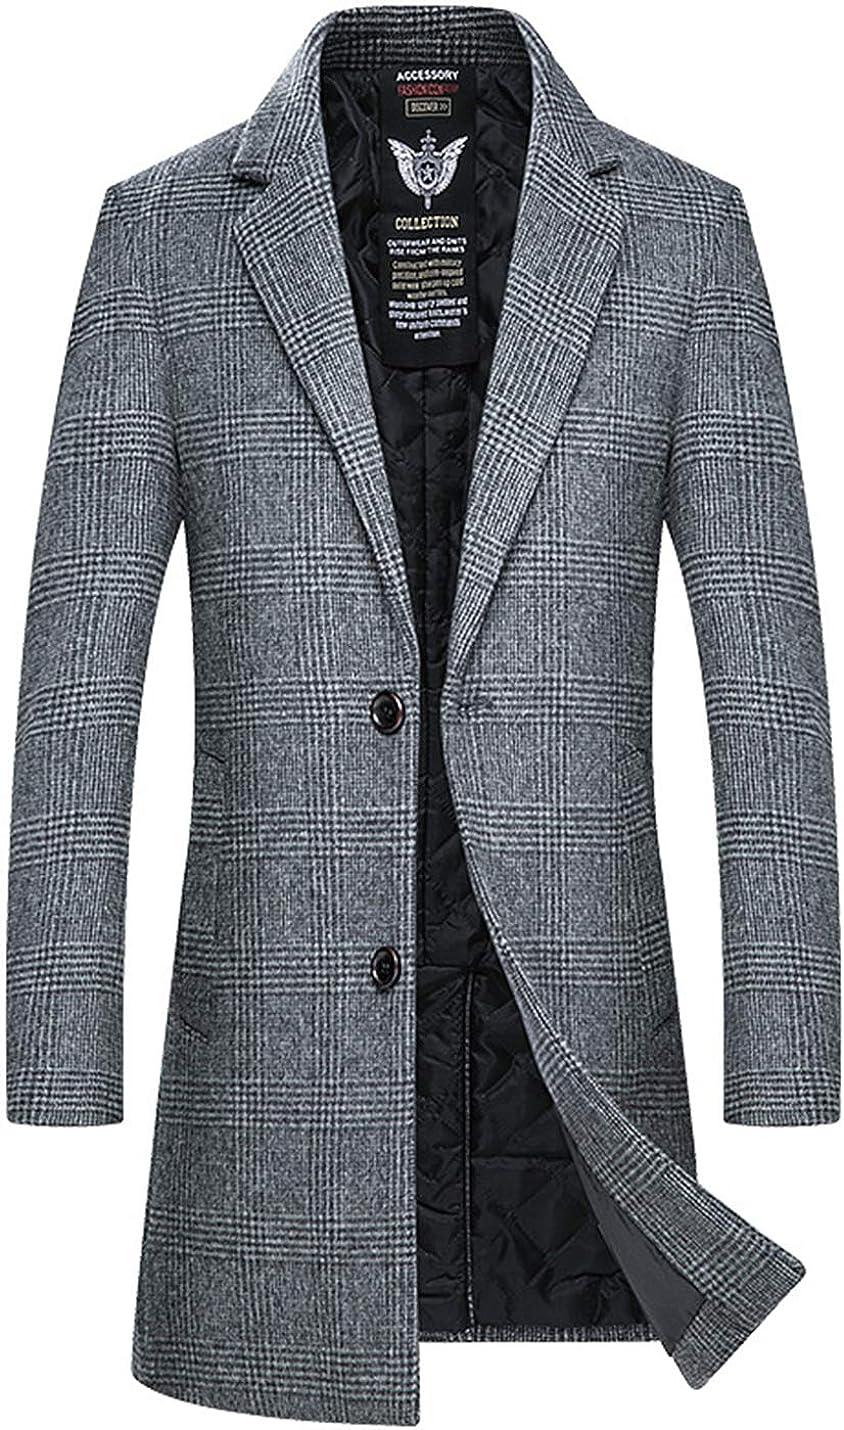 Men Slim Fit Plaid Winter Dress Coat Wool Blend Thick Pea Coat with Pockets